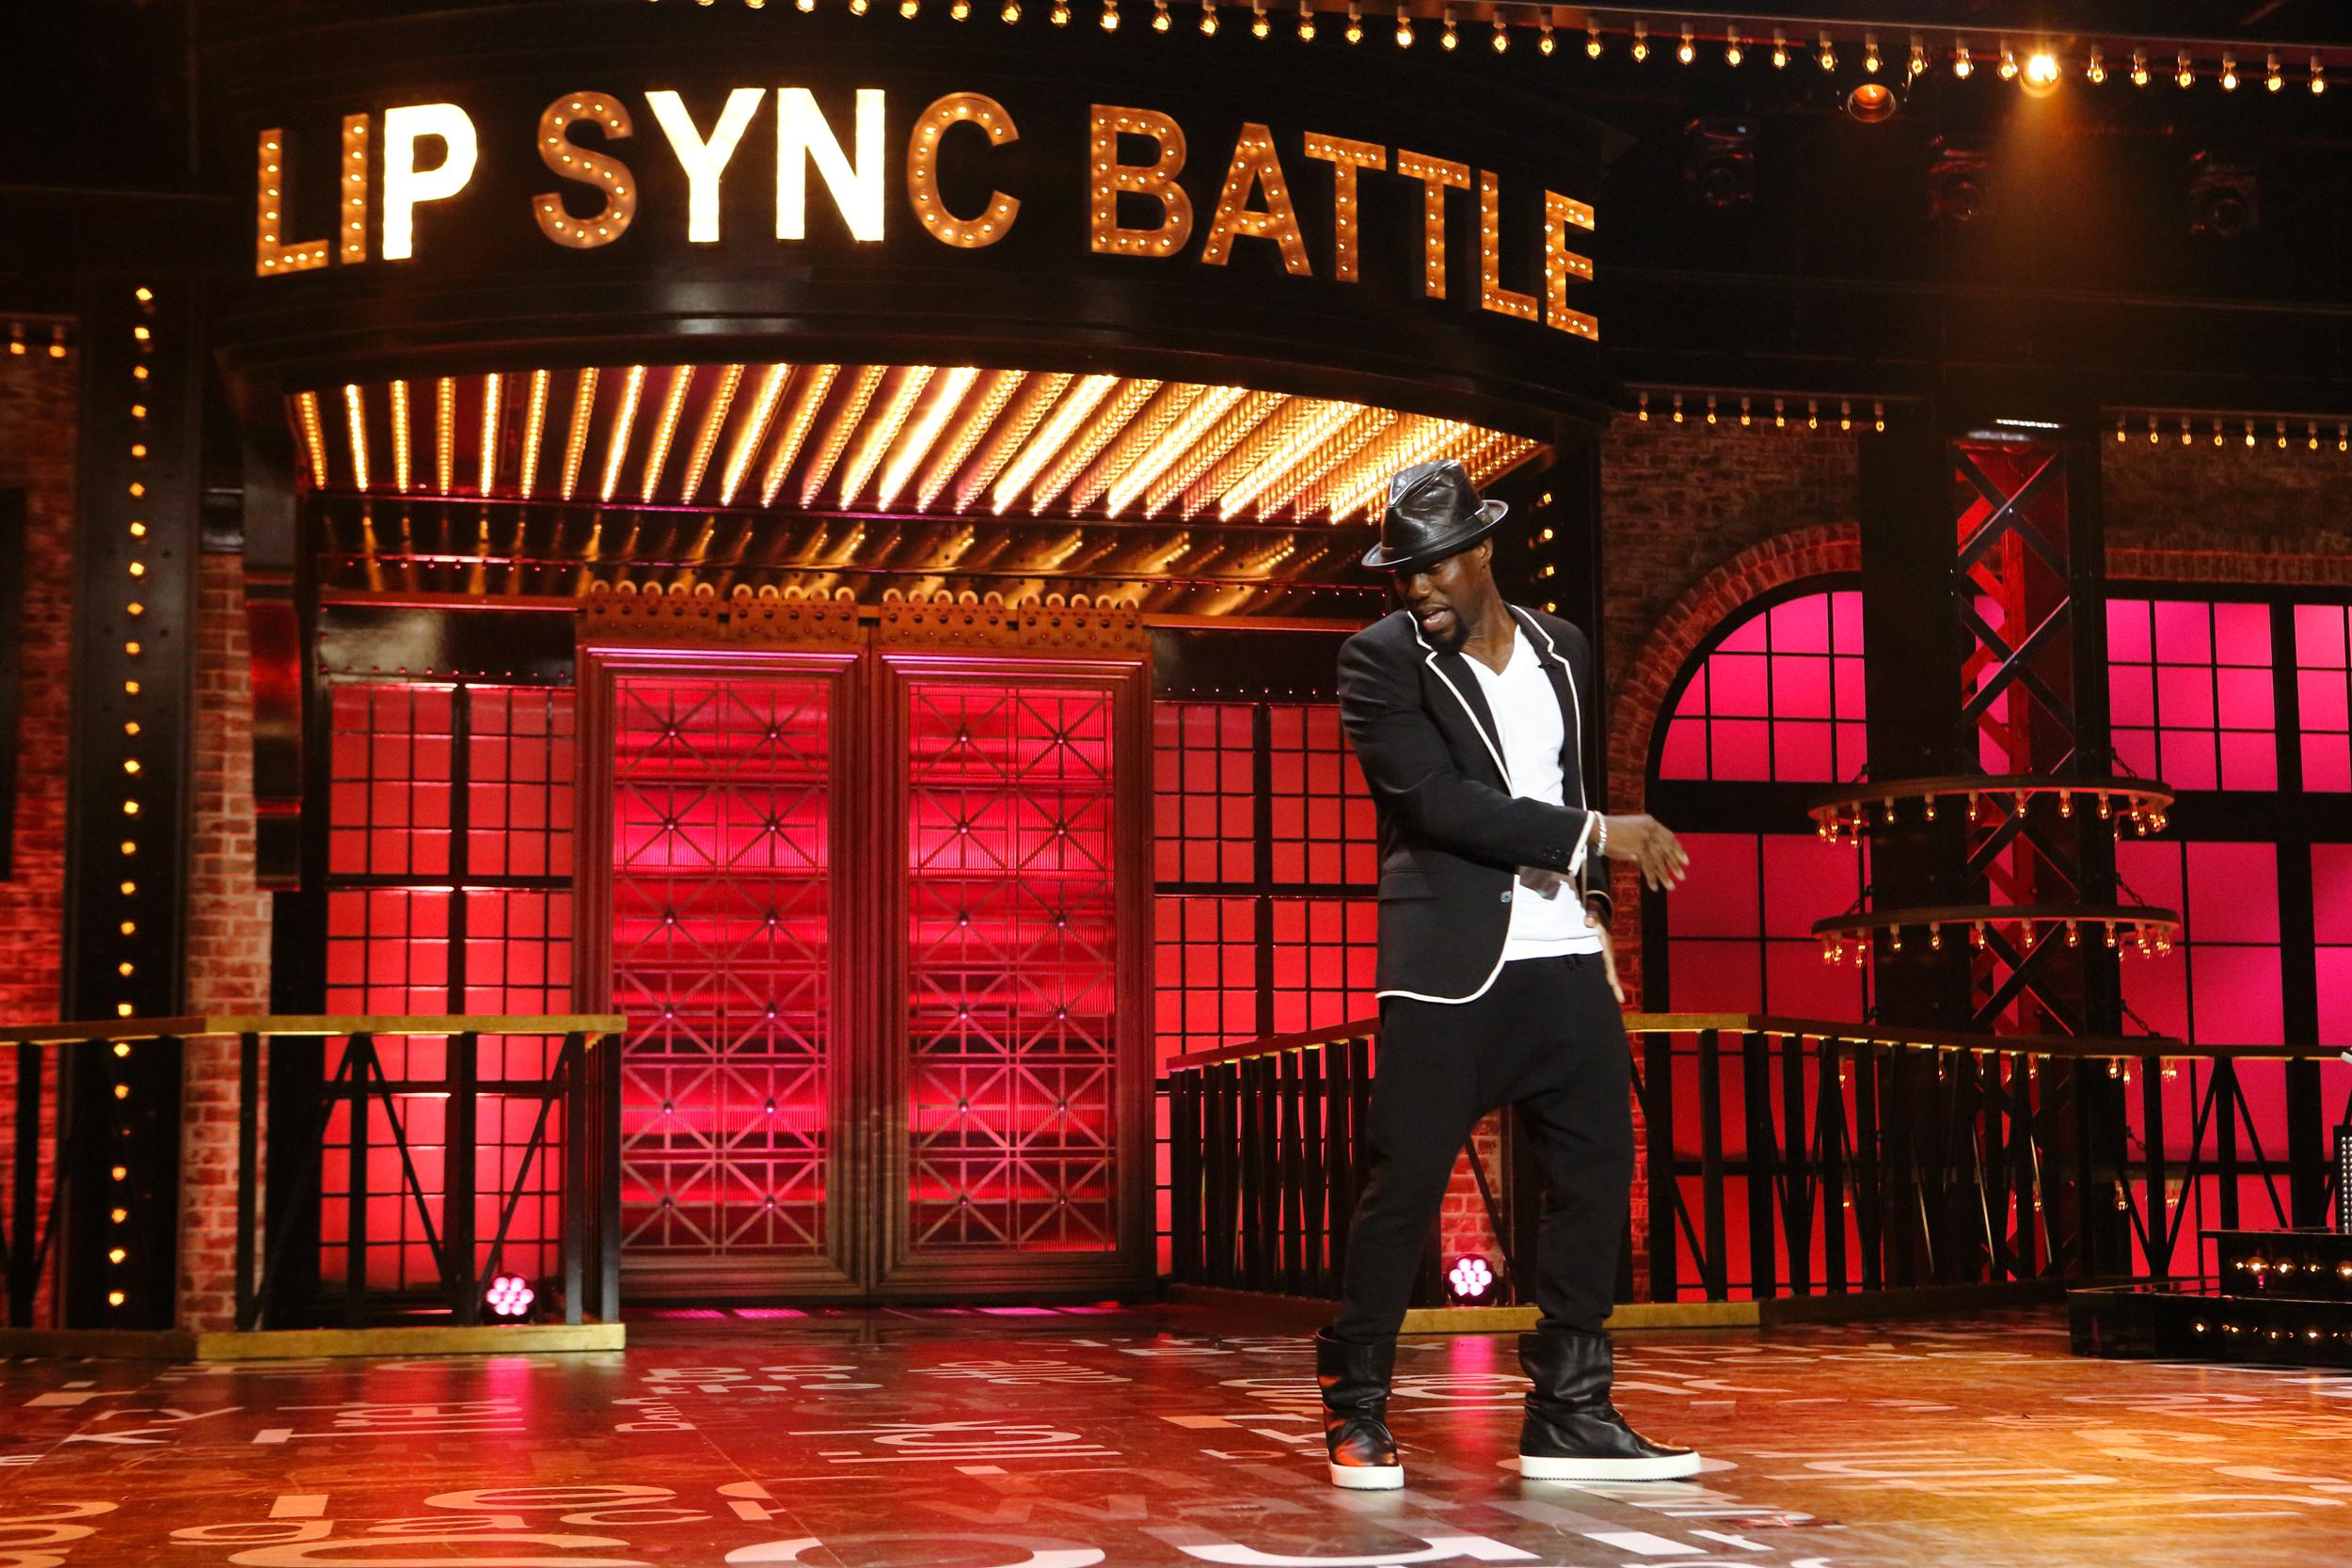 Image of Kevin Hart taken off Lip Sync Battle US season 2, credit: Spike TVImage of Kevin Hart taken off Lip Sync Battle US season 2, credit: Spike TV